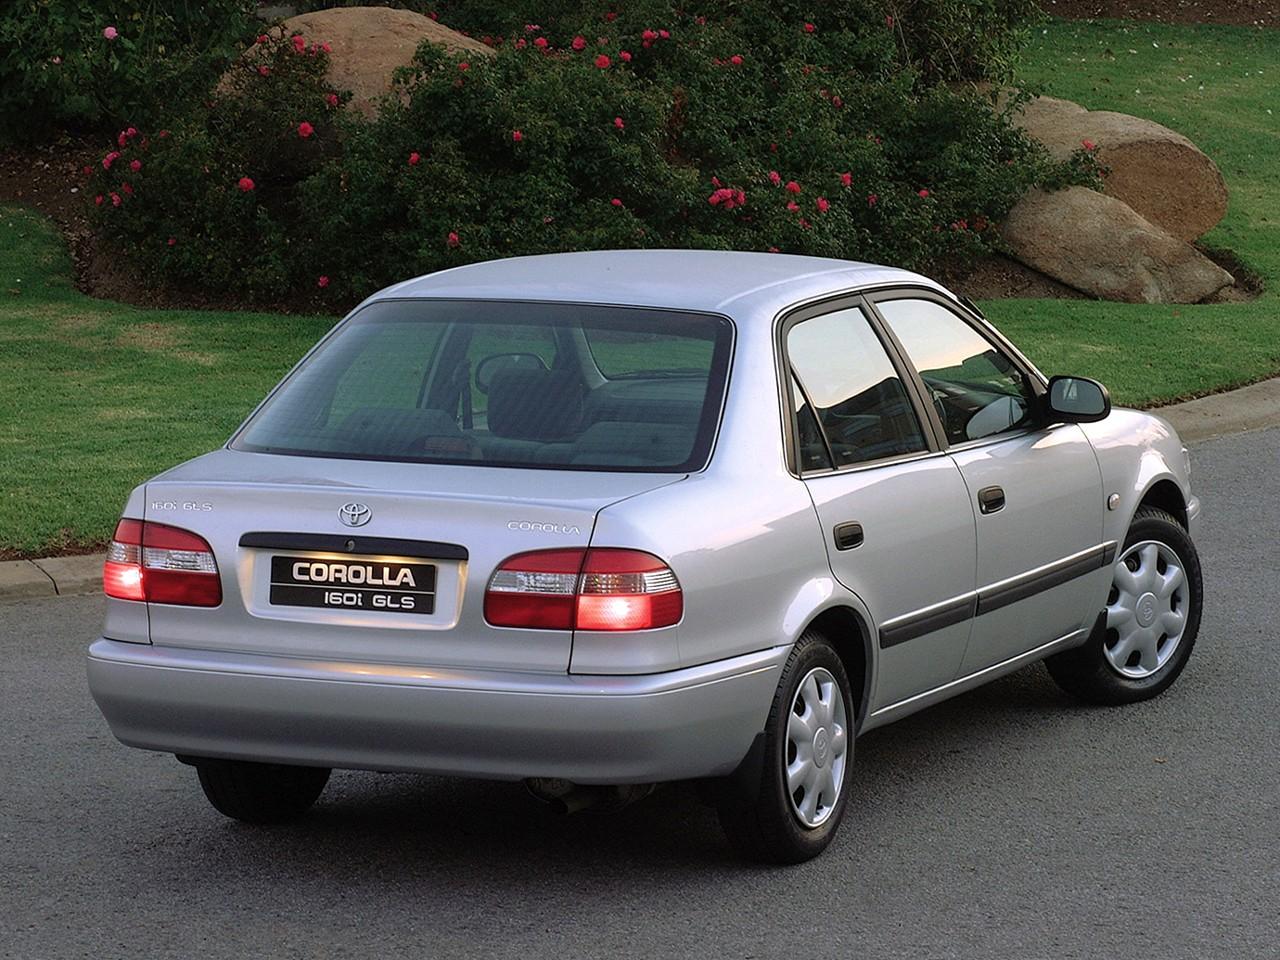 2017 Toyota Corolla Le >> TOYOTA Corolla Sedan specs - 1997, 1998, 1999, 2000 - autoevolution